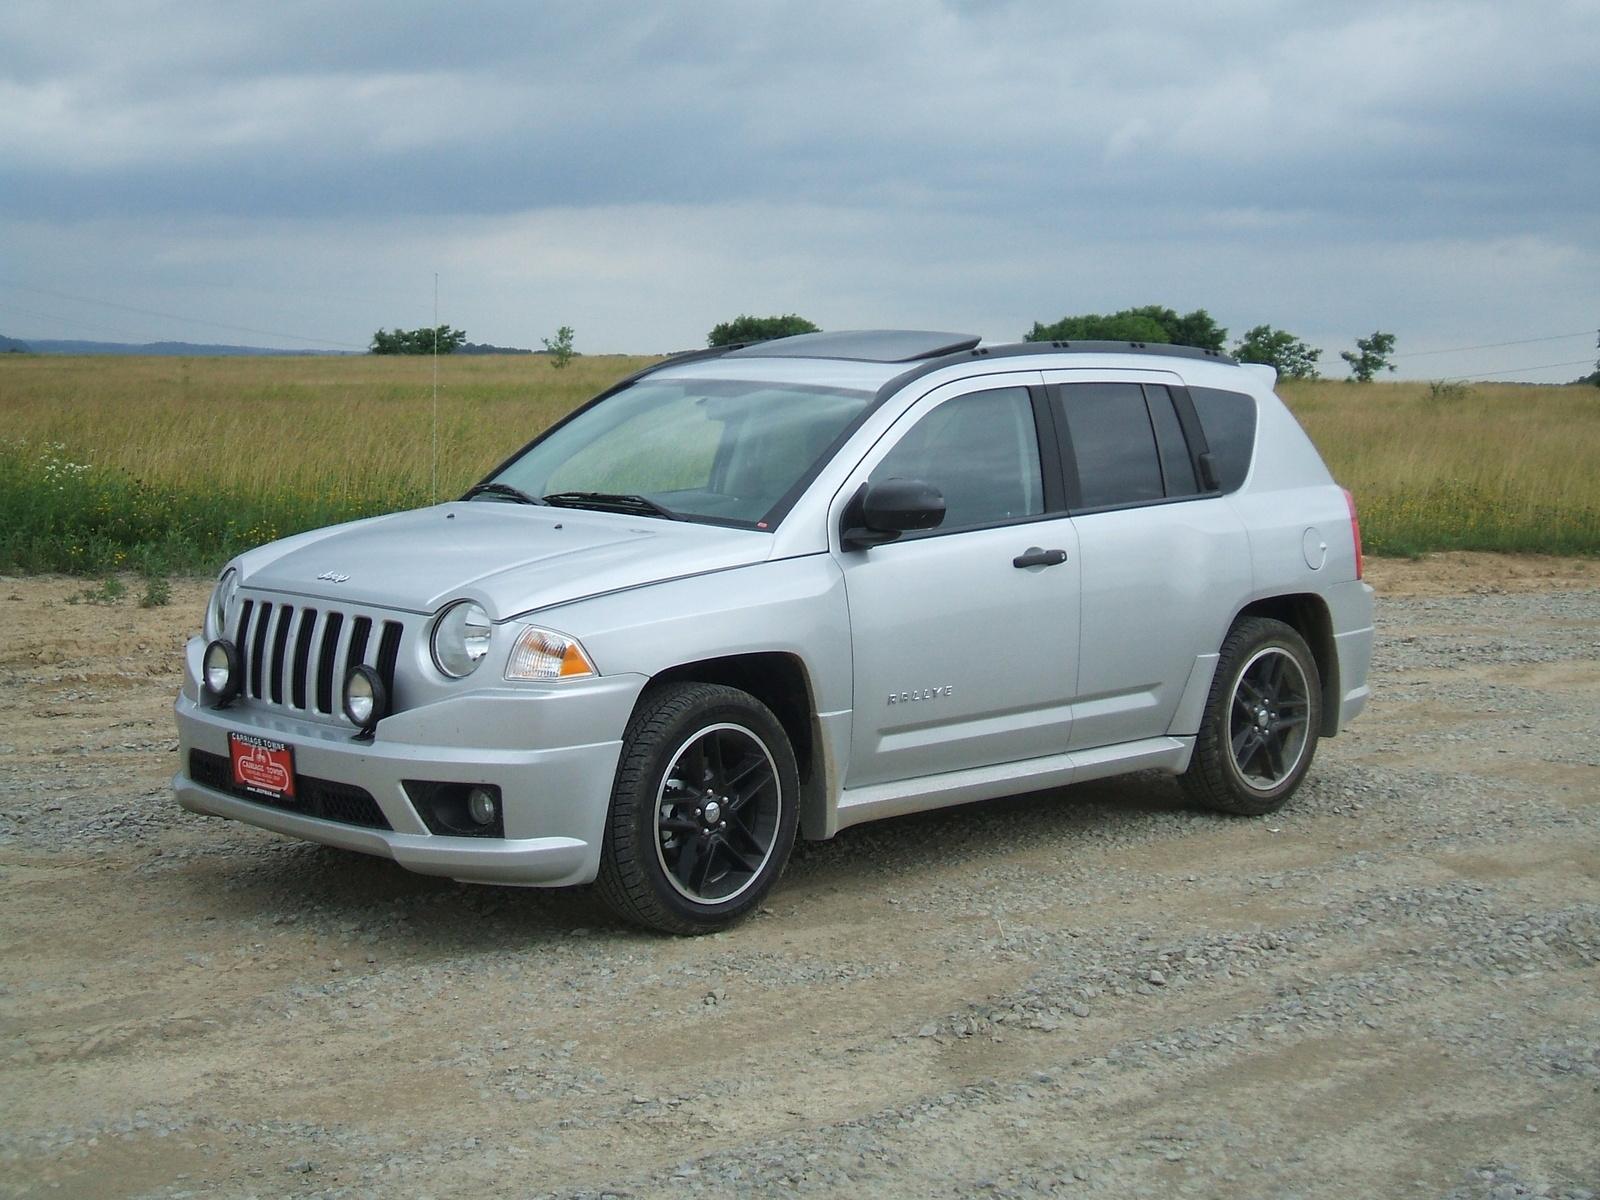 jeep green metallic 2008 jeep compass sport 4x4 exterior photo images. Black Bedroom Furniture Sets. Home Design Ideas